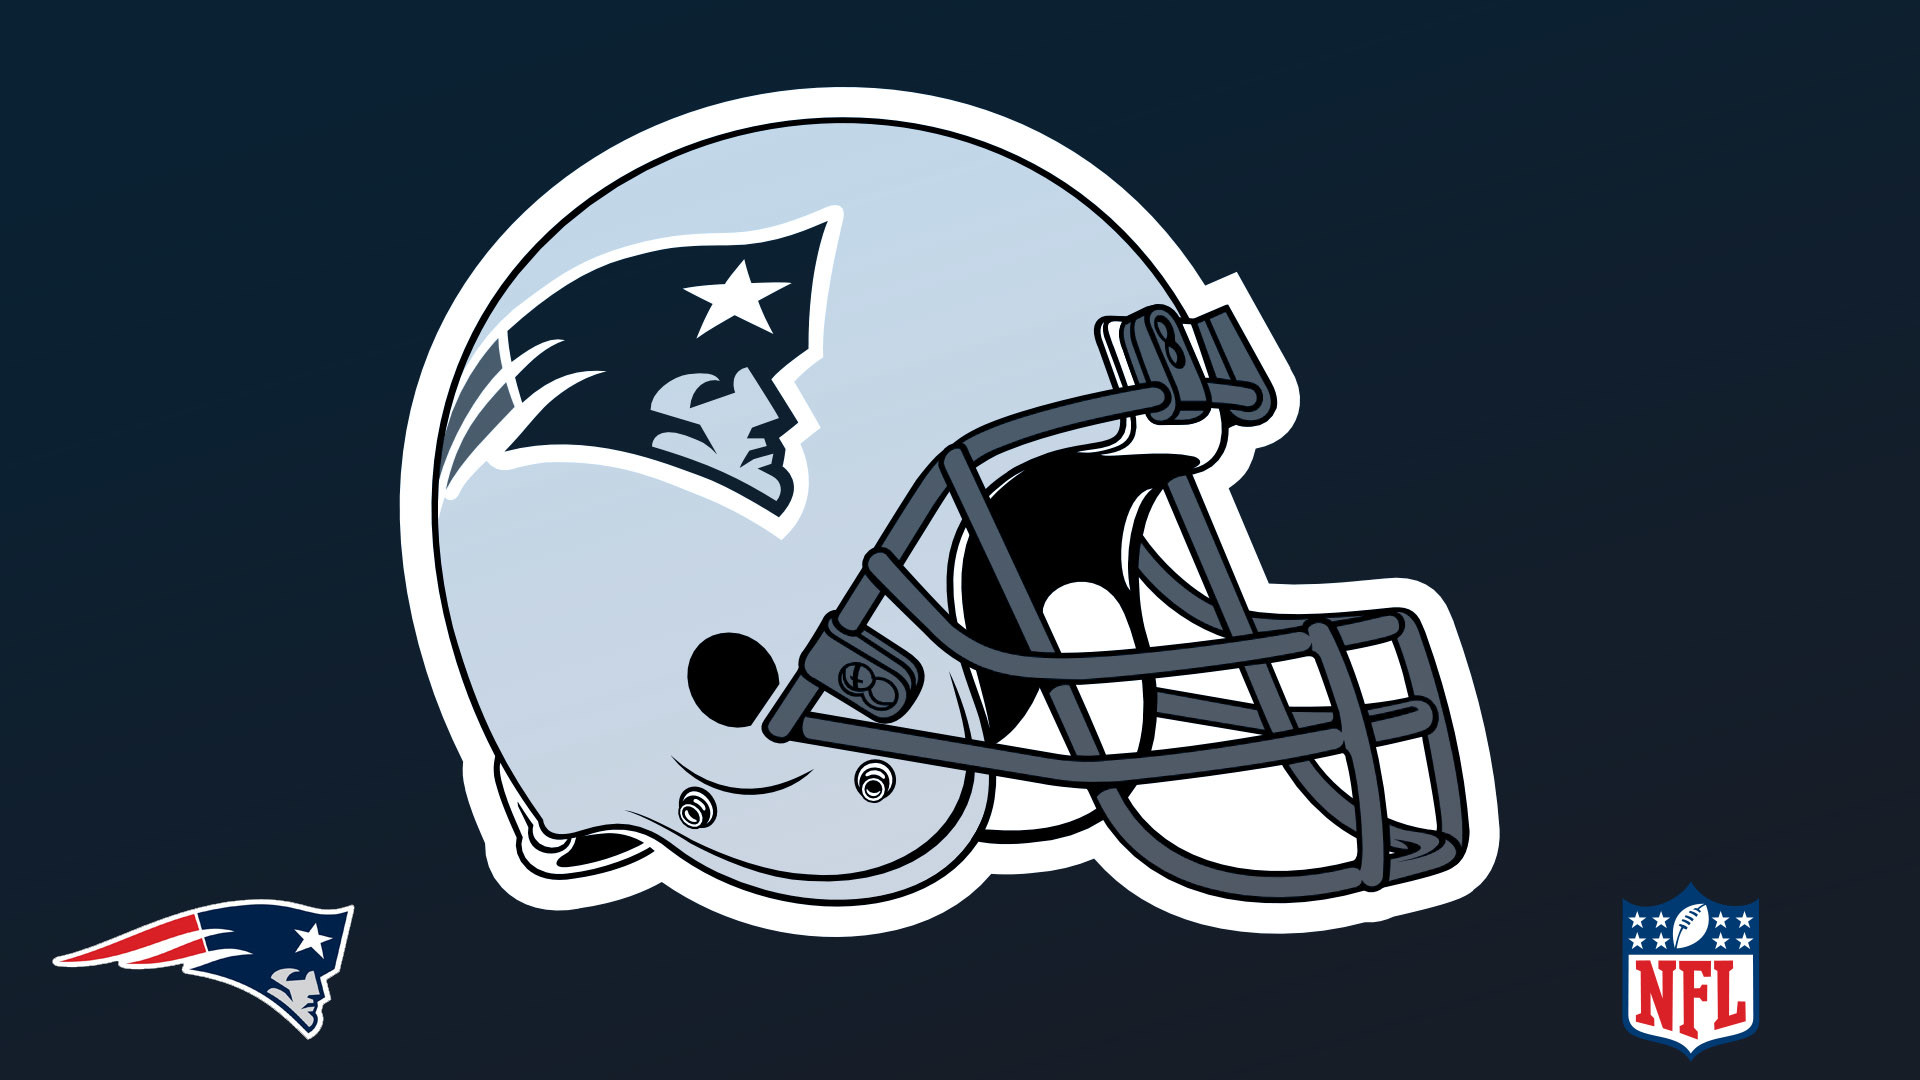 Tom Brady Wallpaper Iphone X New England Patriots Logo Wallpaper 72 Images